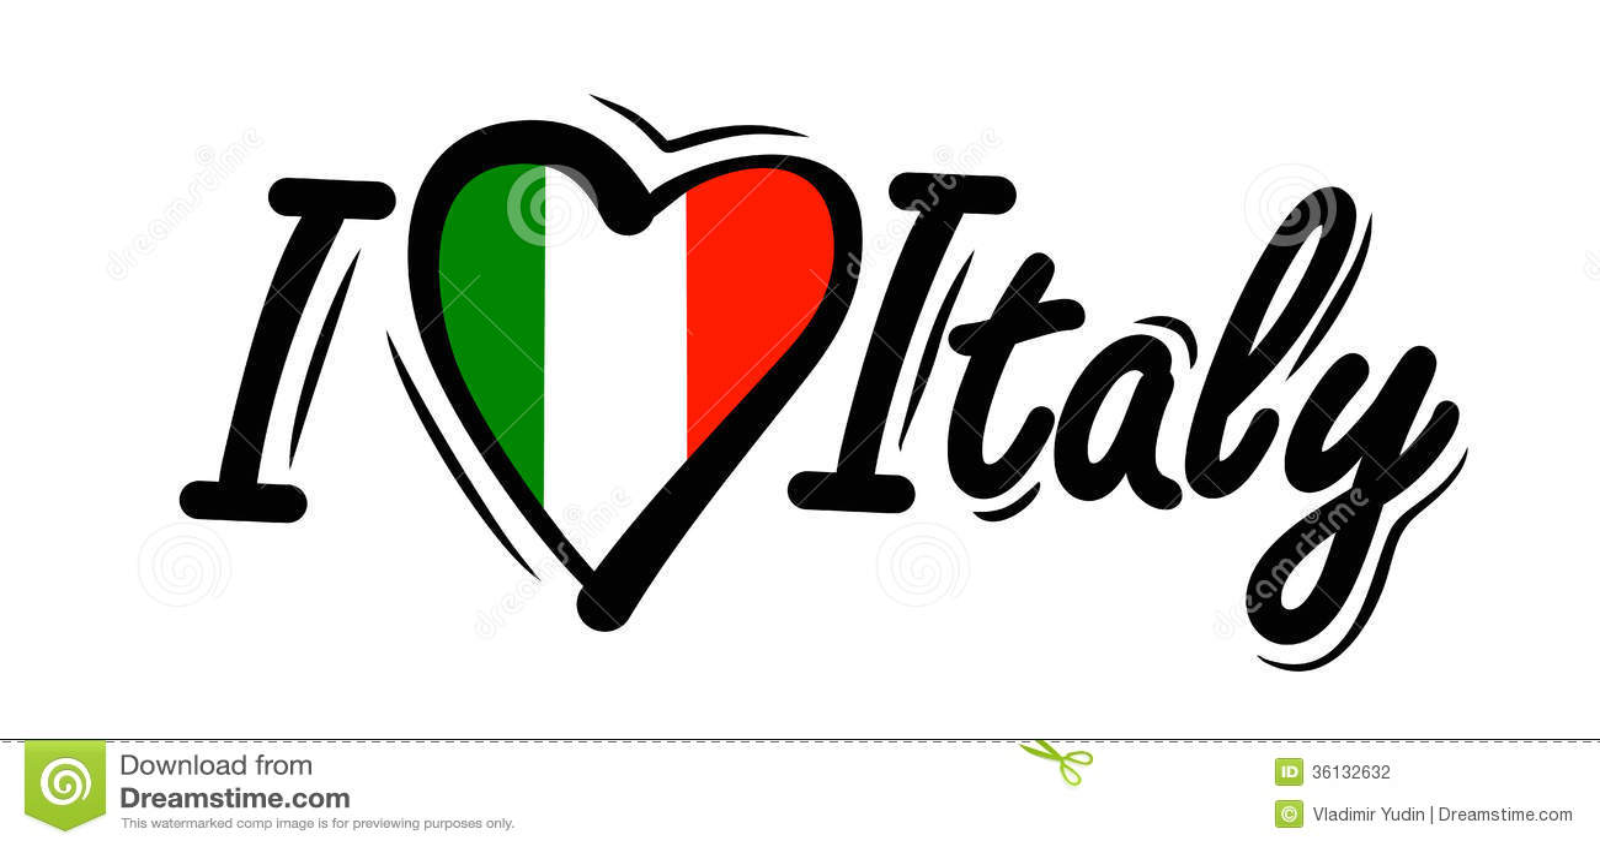 I Love Italy Vector Stock Photography Image 36132632